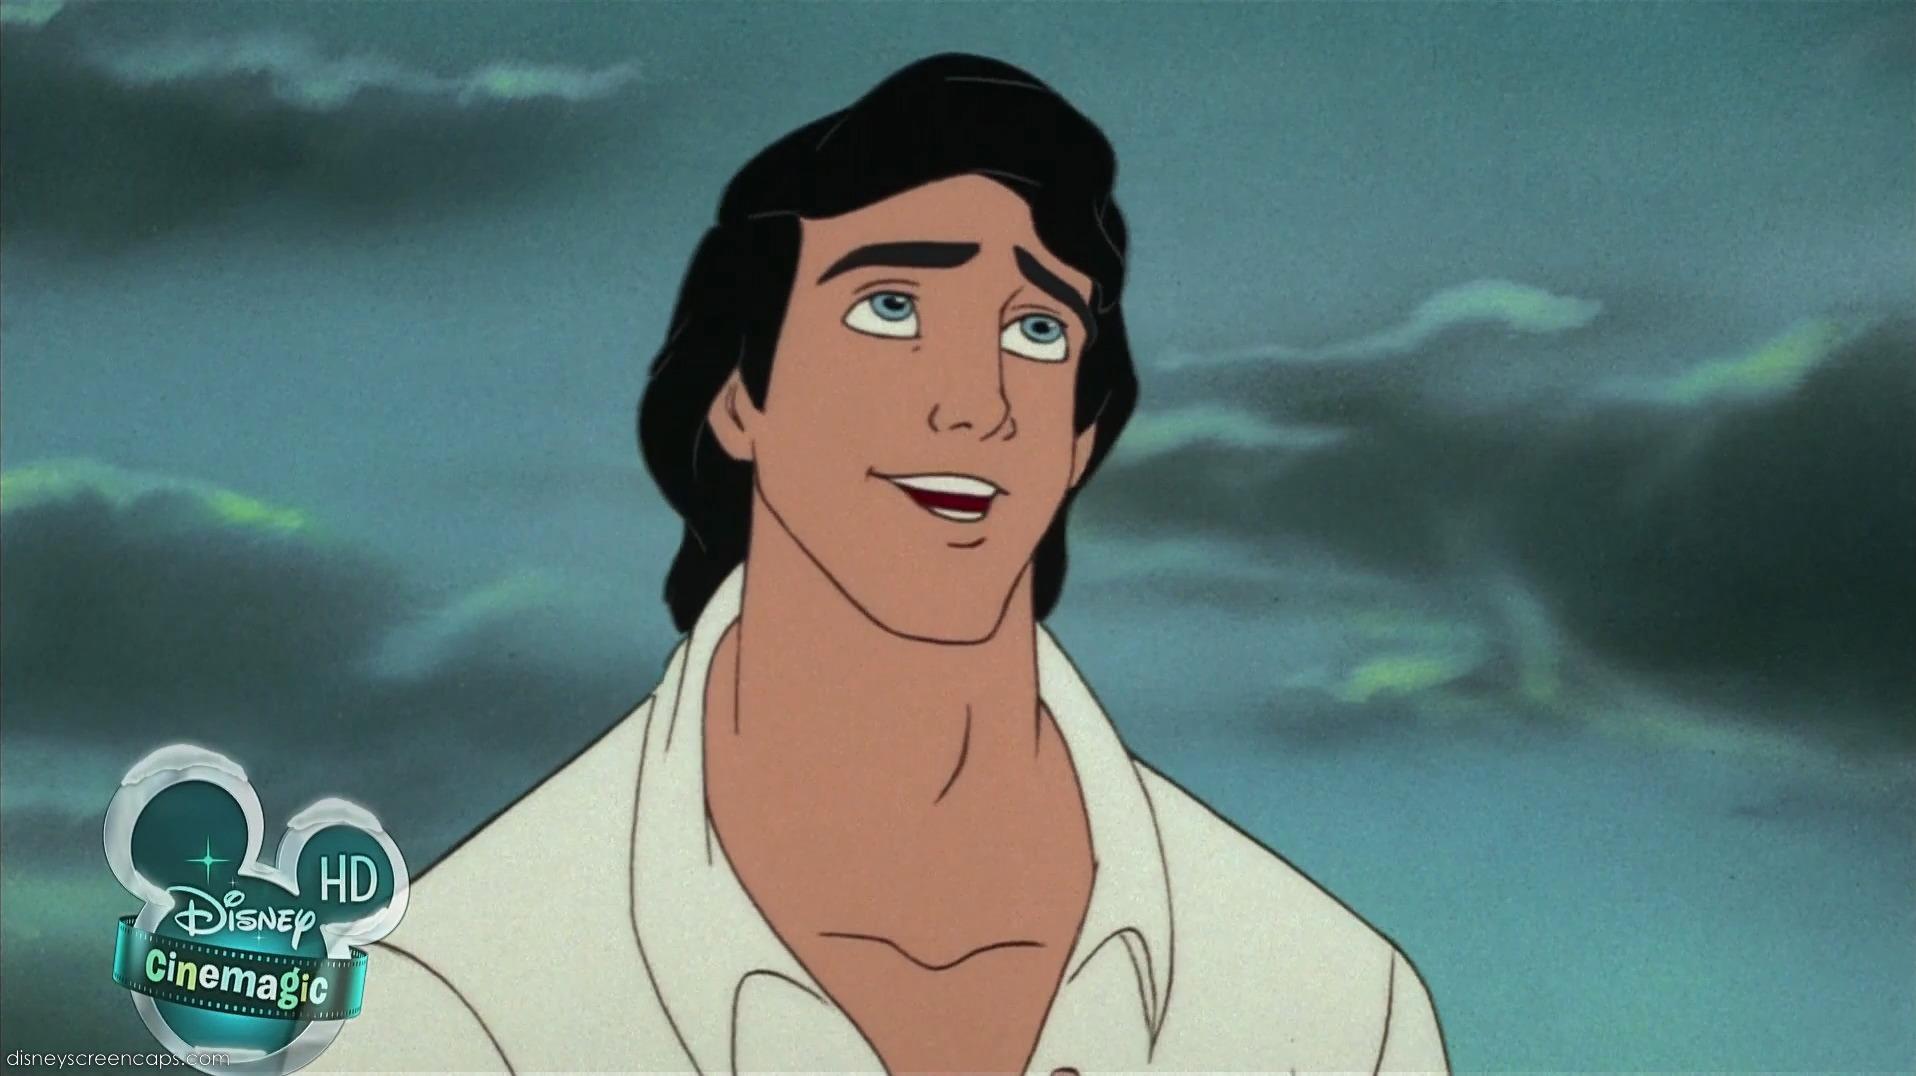 Hot Male Cartoon Characters